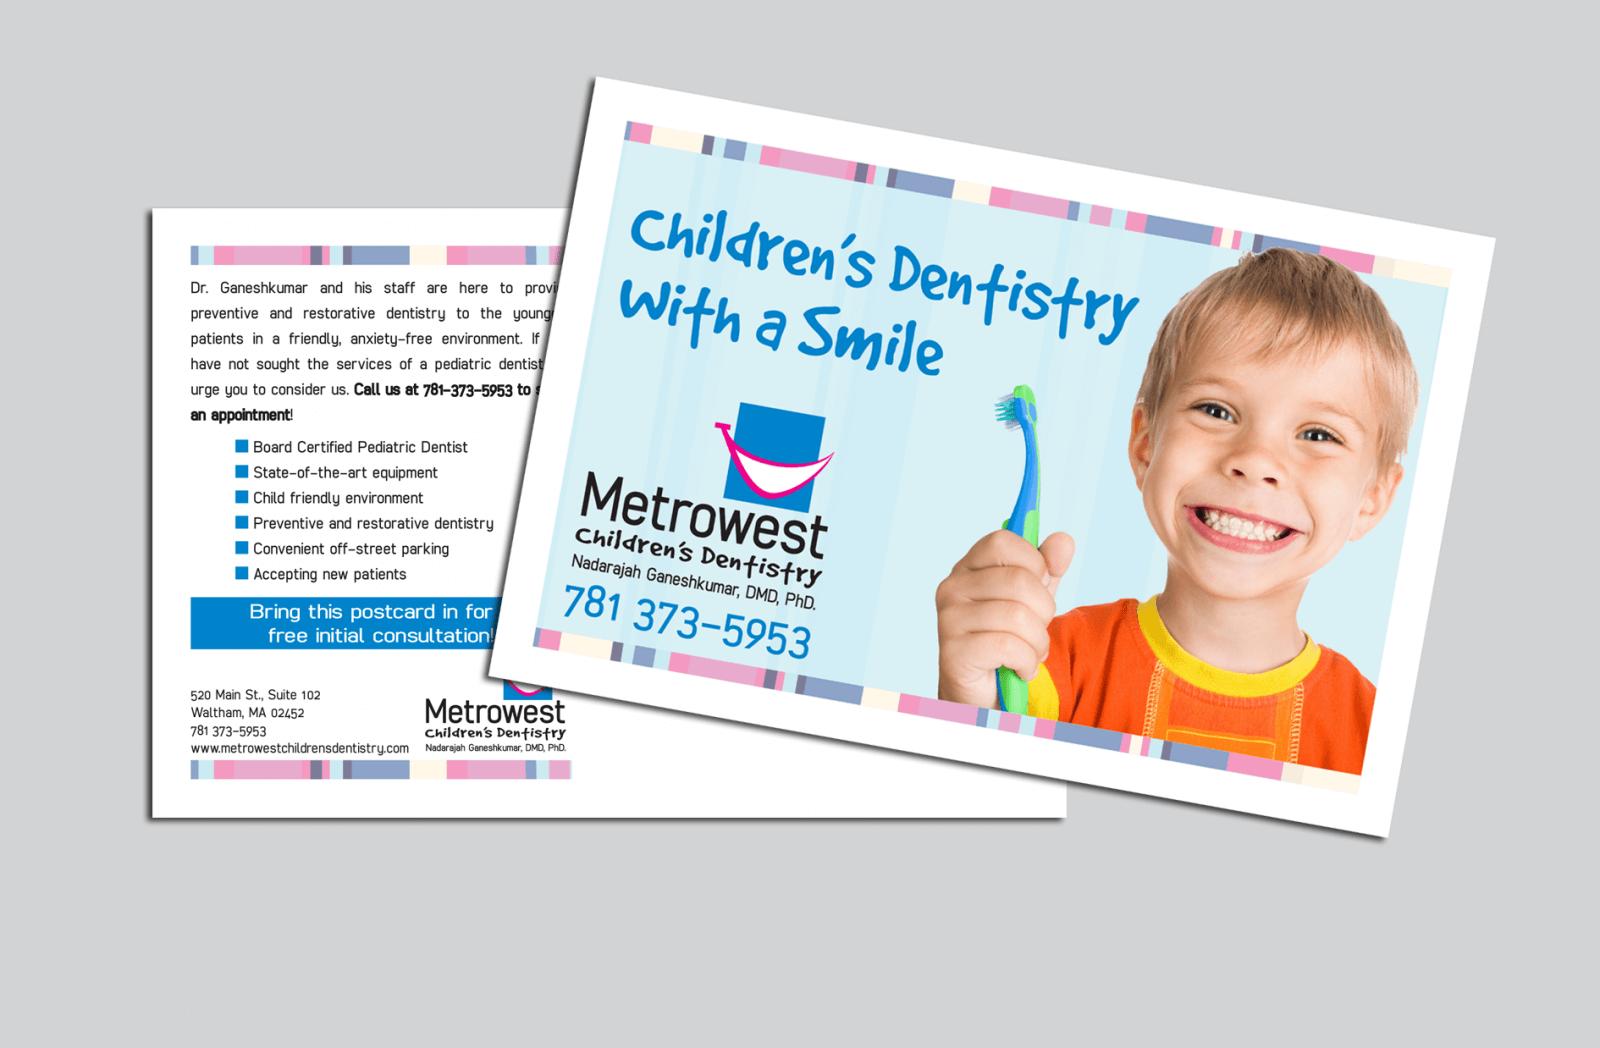 Metrowest Children's Dentristry postcard